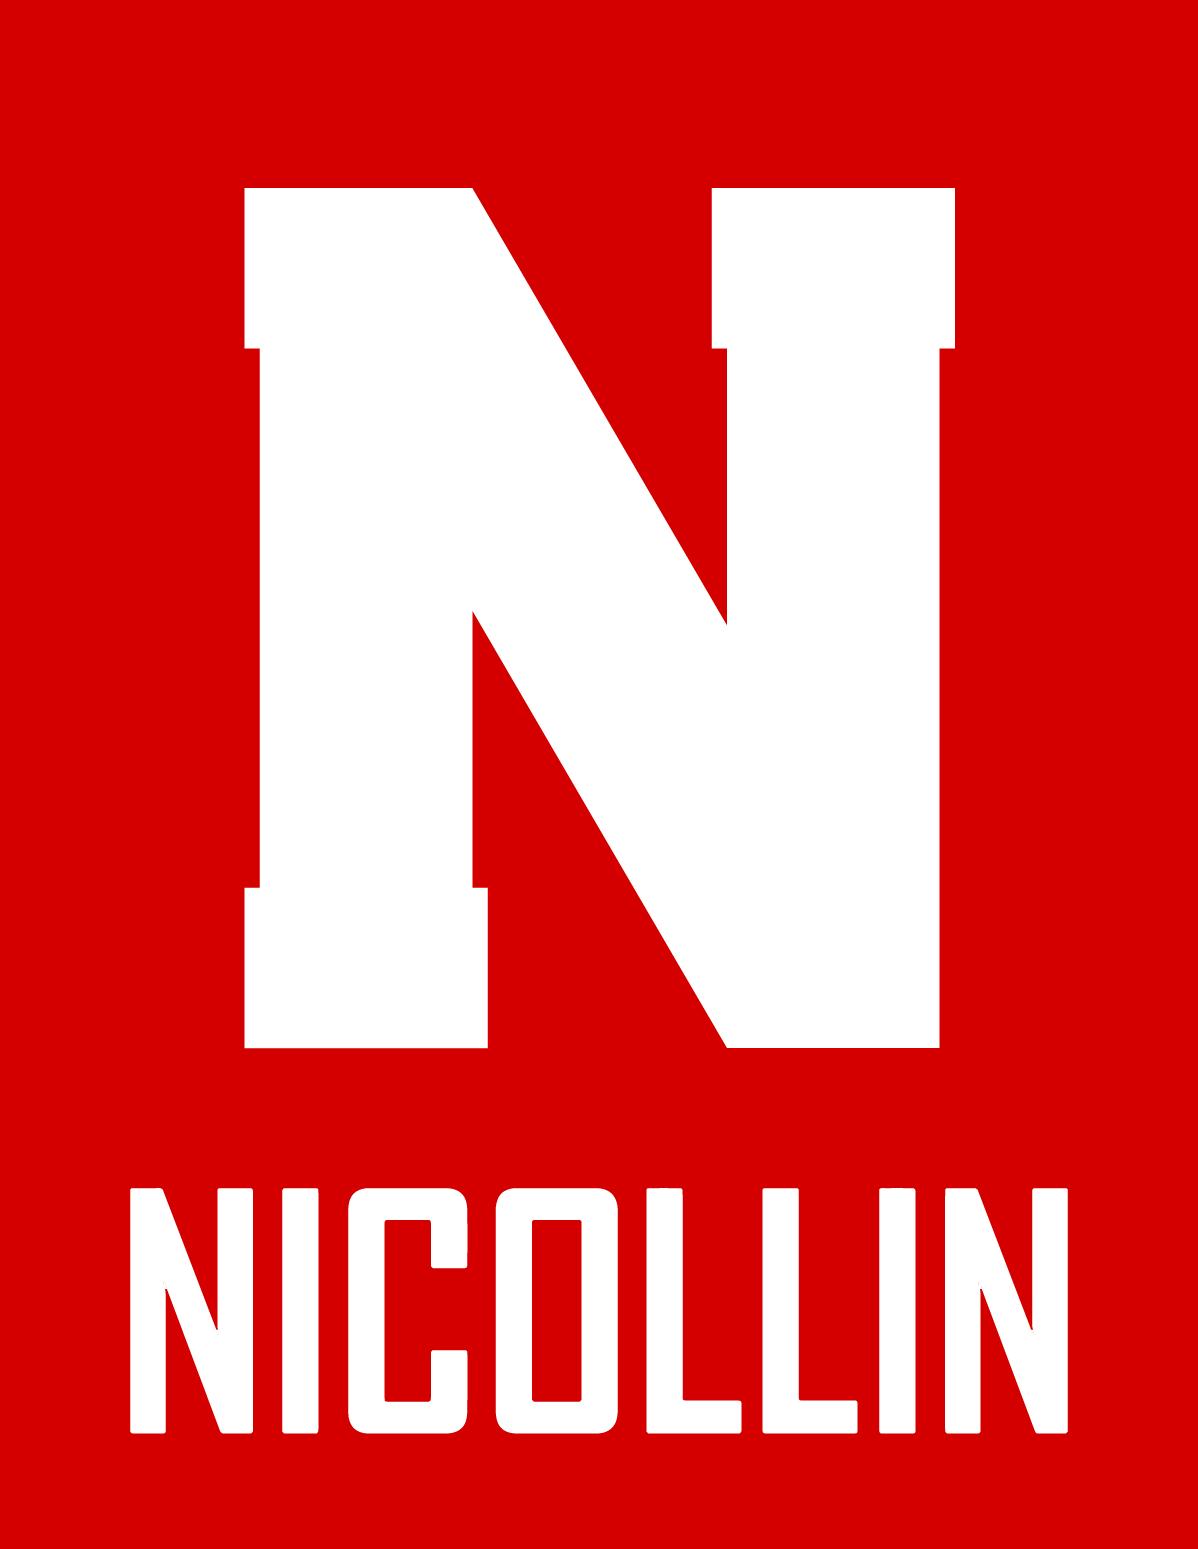 groupe nicollin wikipedia